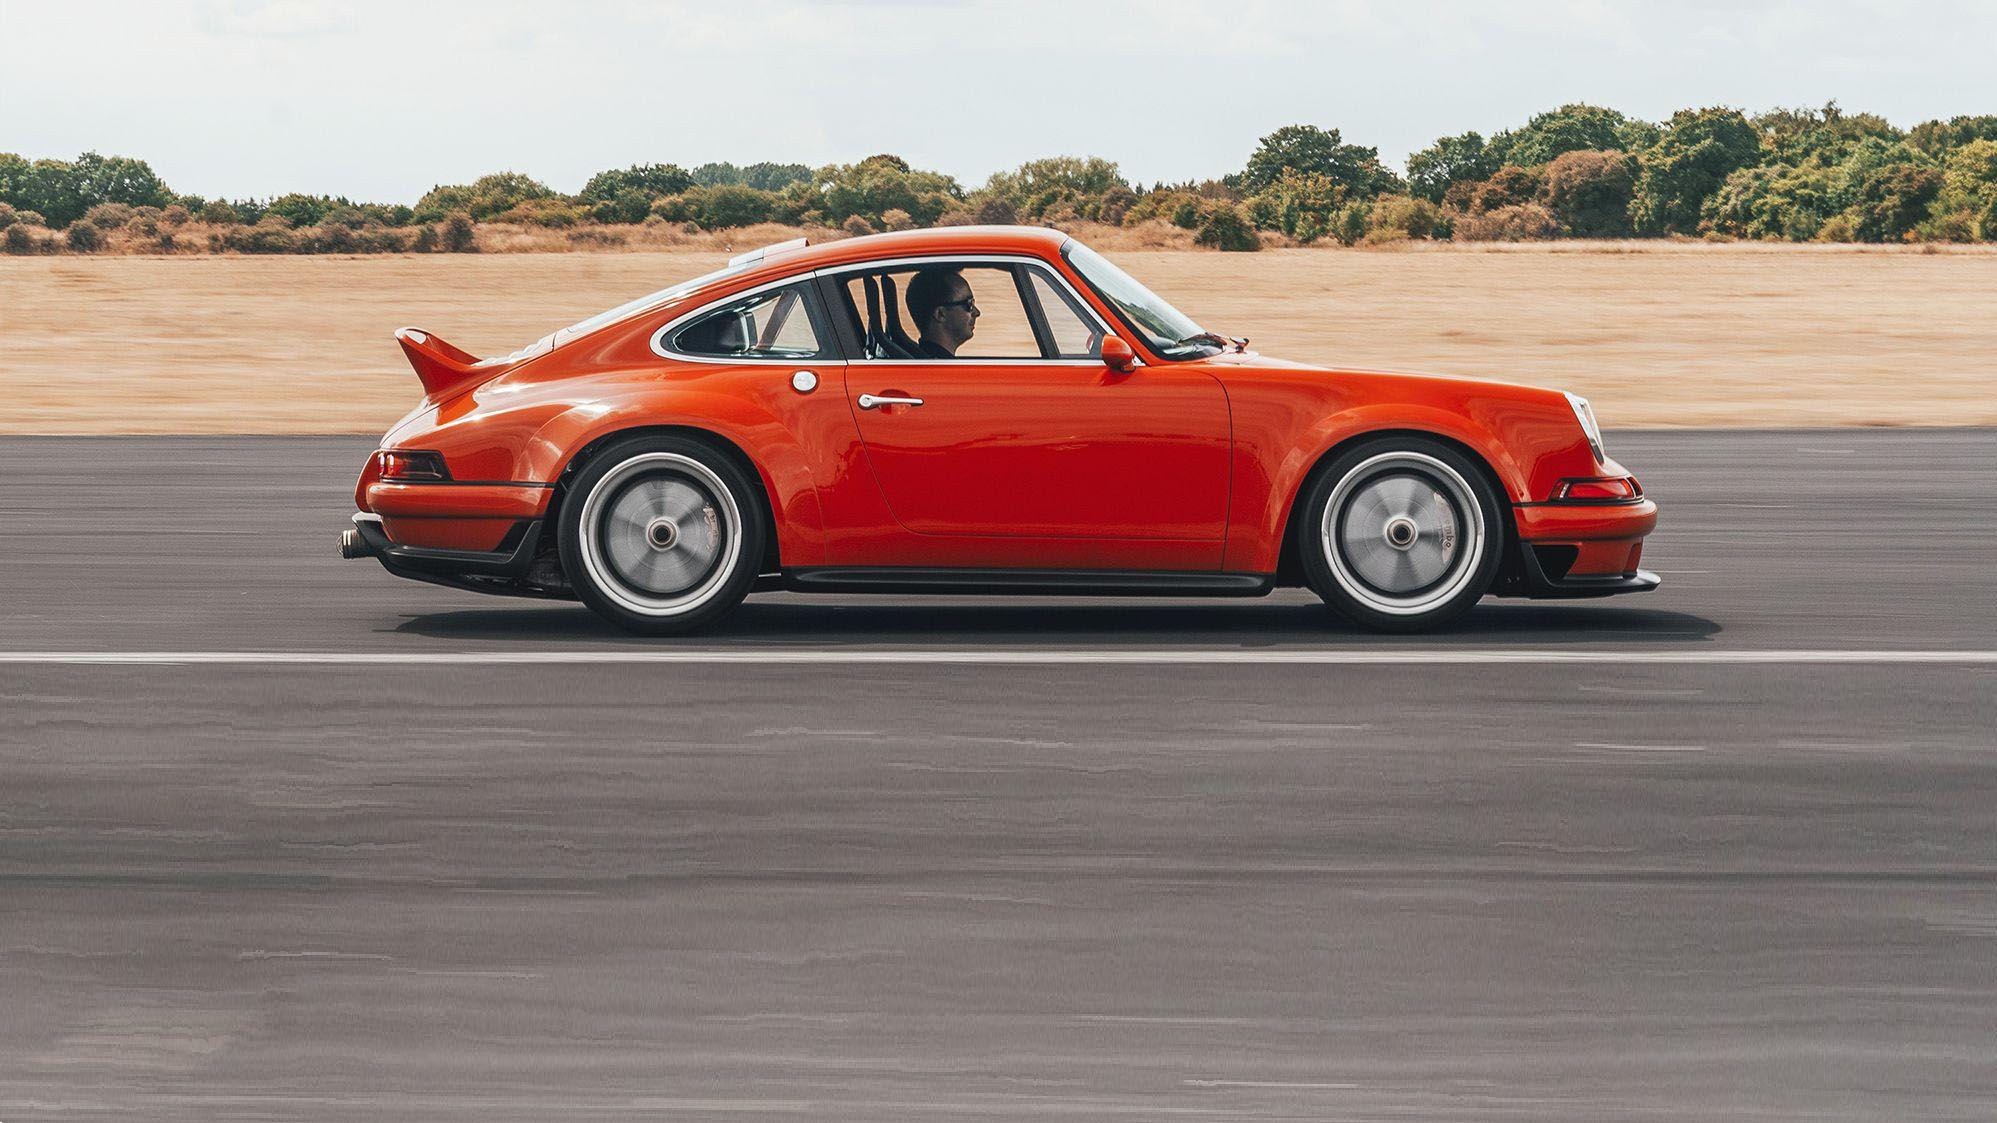 meet 8ca64 7a533 Porsche 911 Reimagined by Singer Vehicle Design Dynamics and Lightweighting  Study